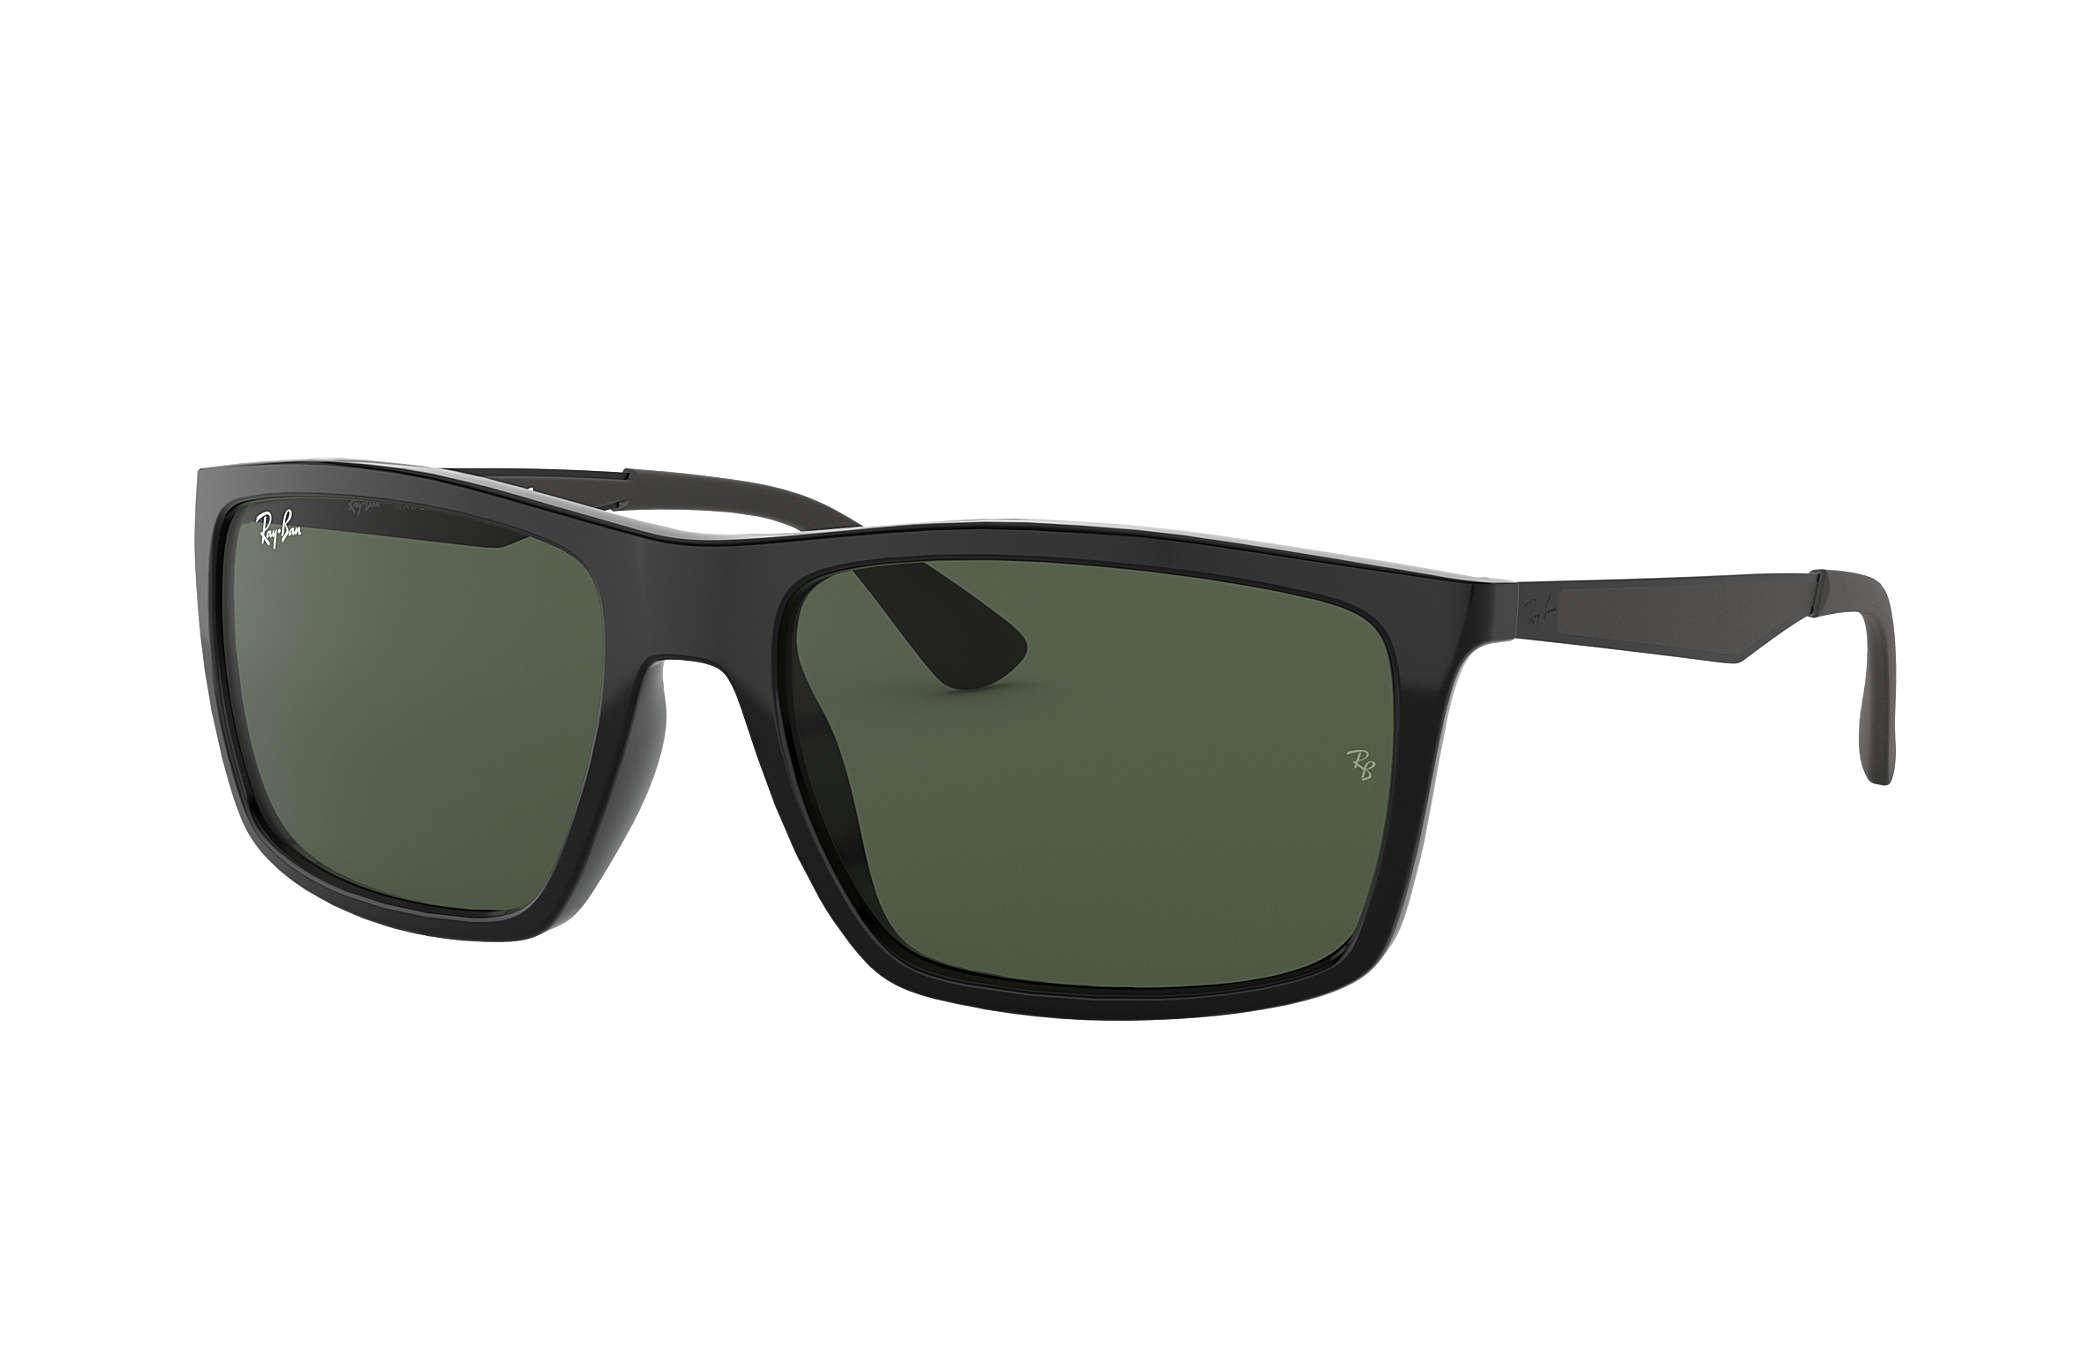 2174a5316bd Ray-Ban RB4228 Black - Nylon - Green Lenses - 0RB4228601 7158